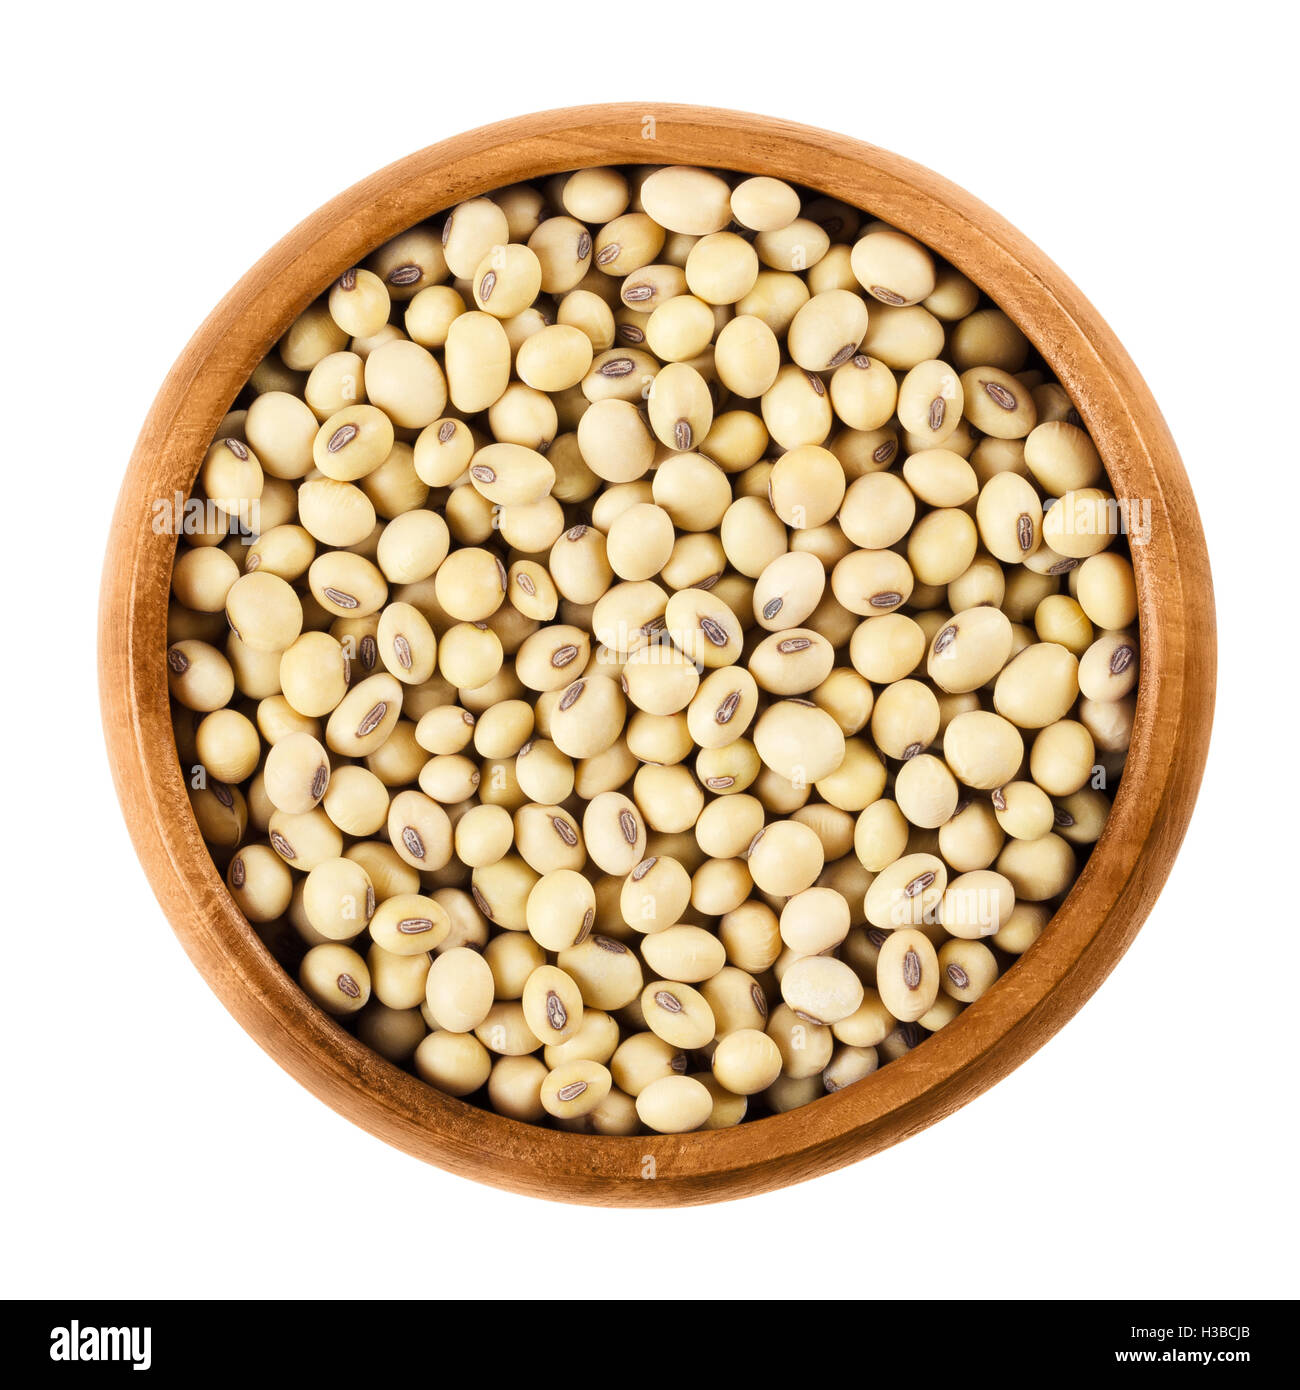 how to make soya bean